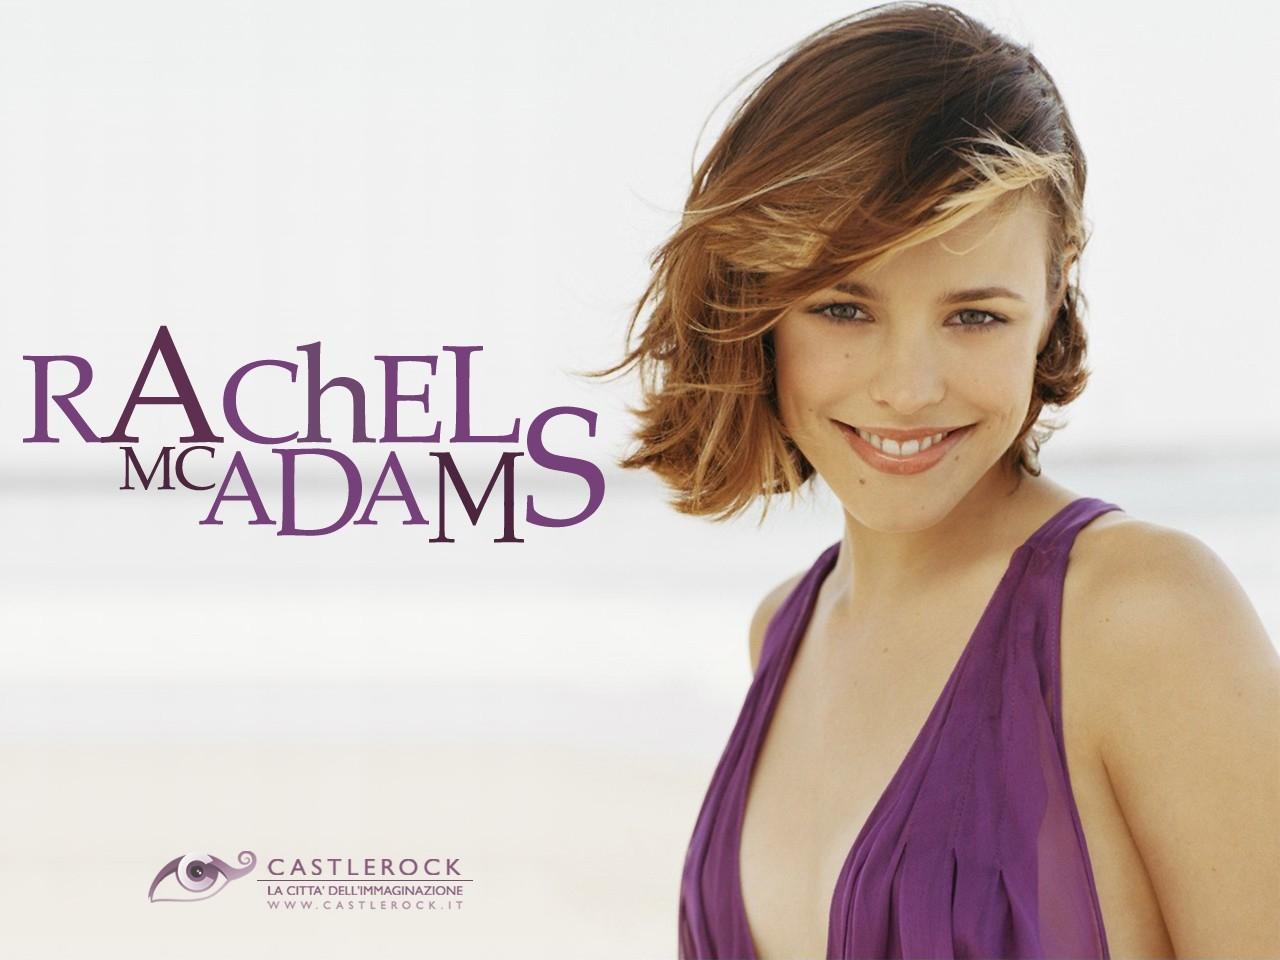 Wallpaper di Rachel McAdams con abito viola